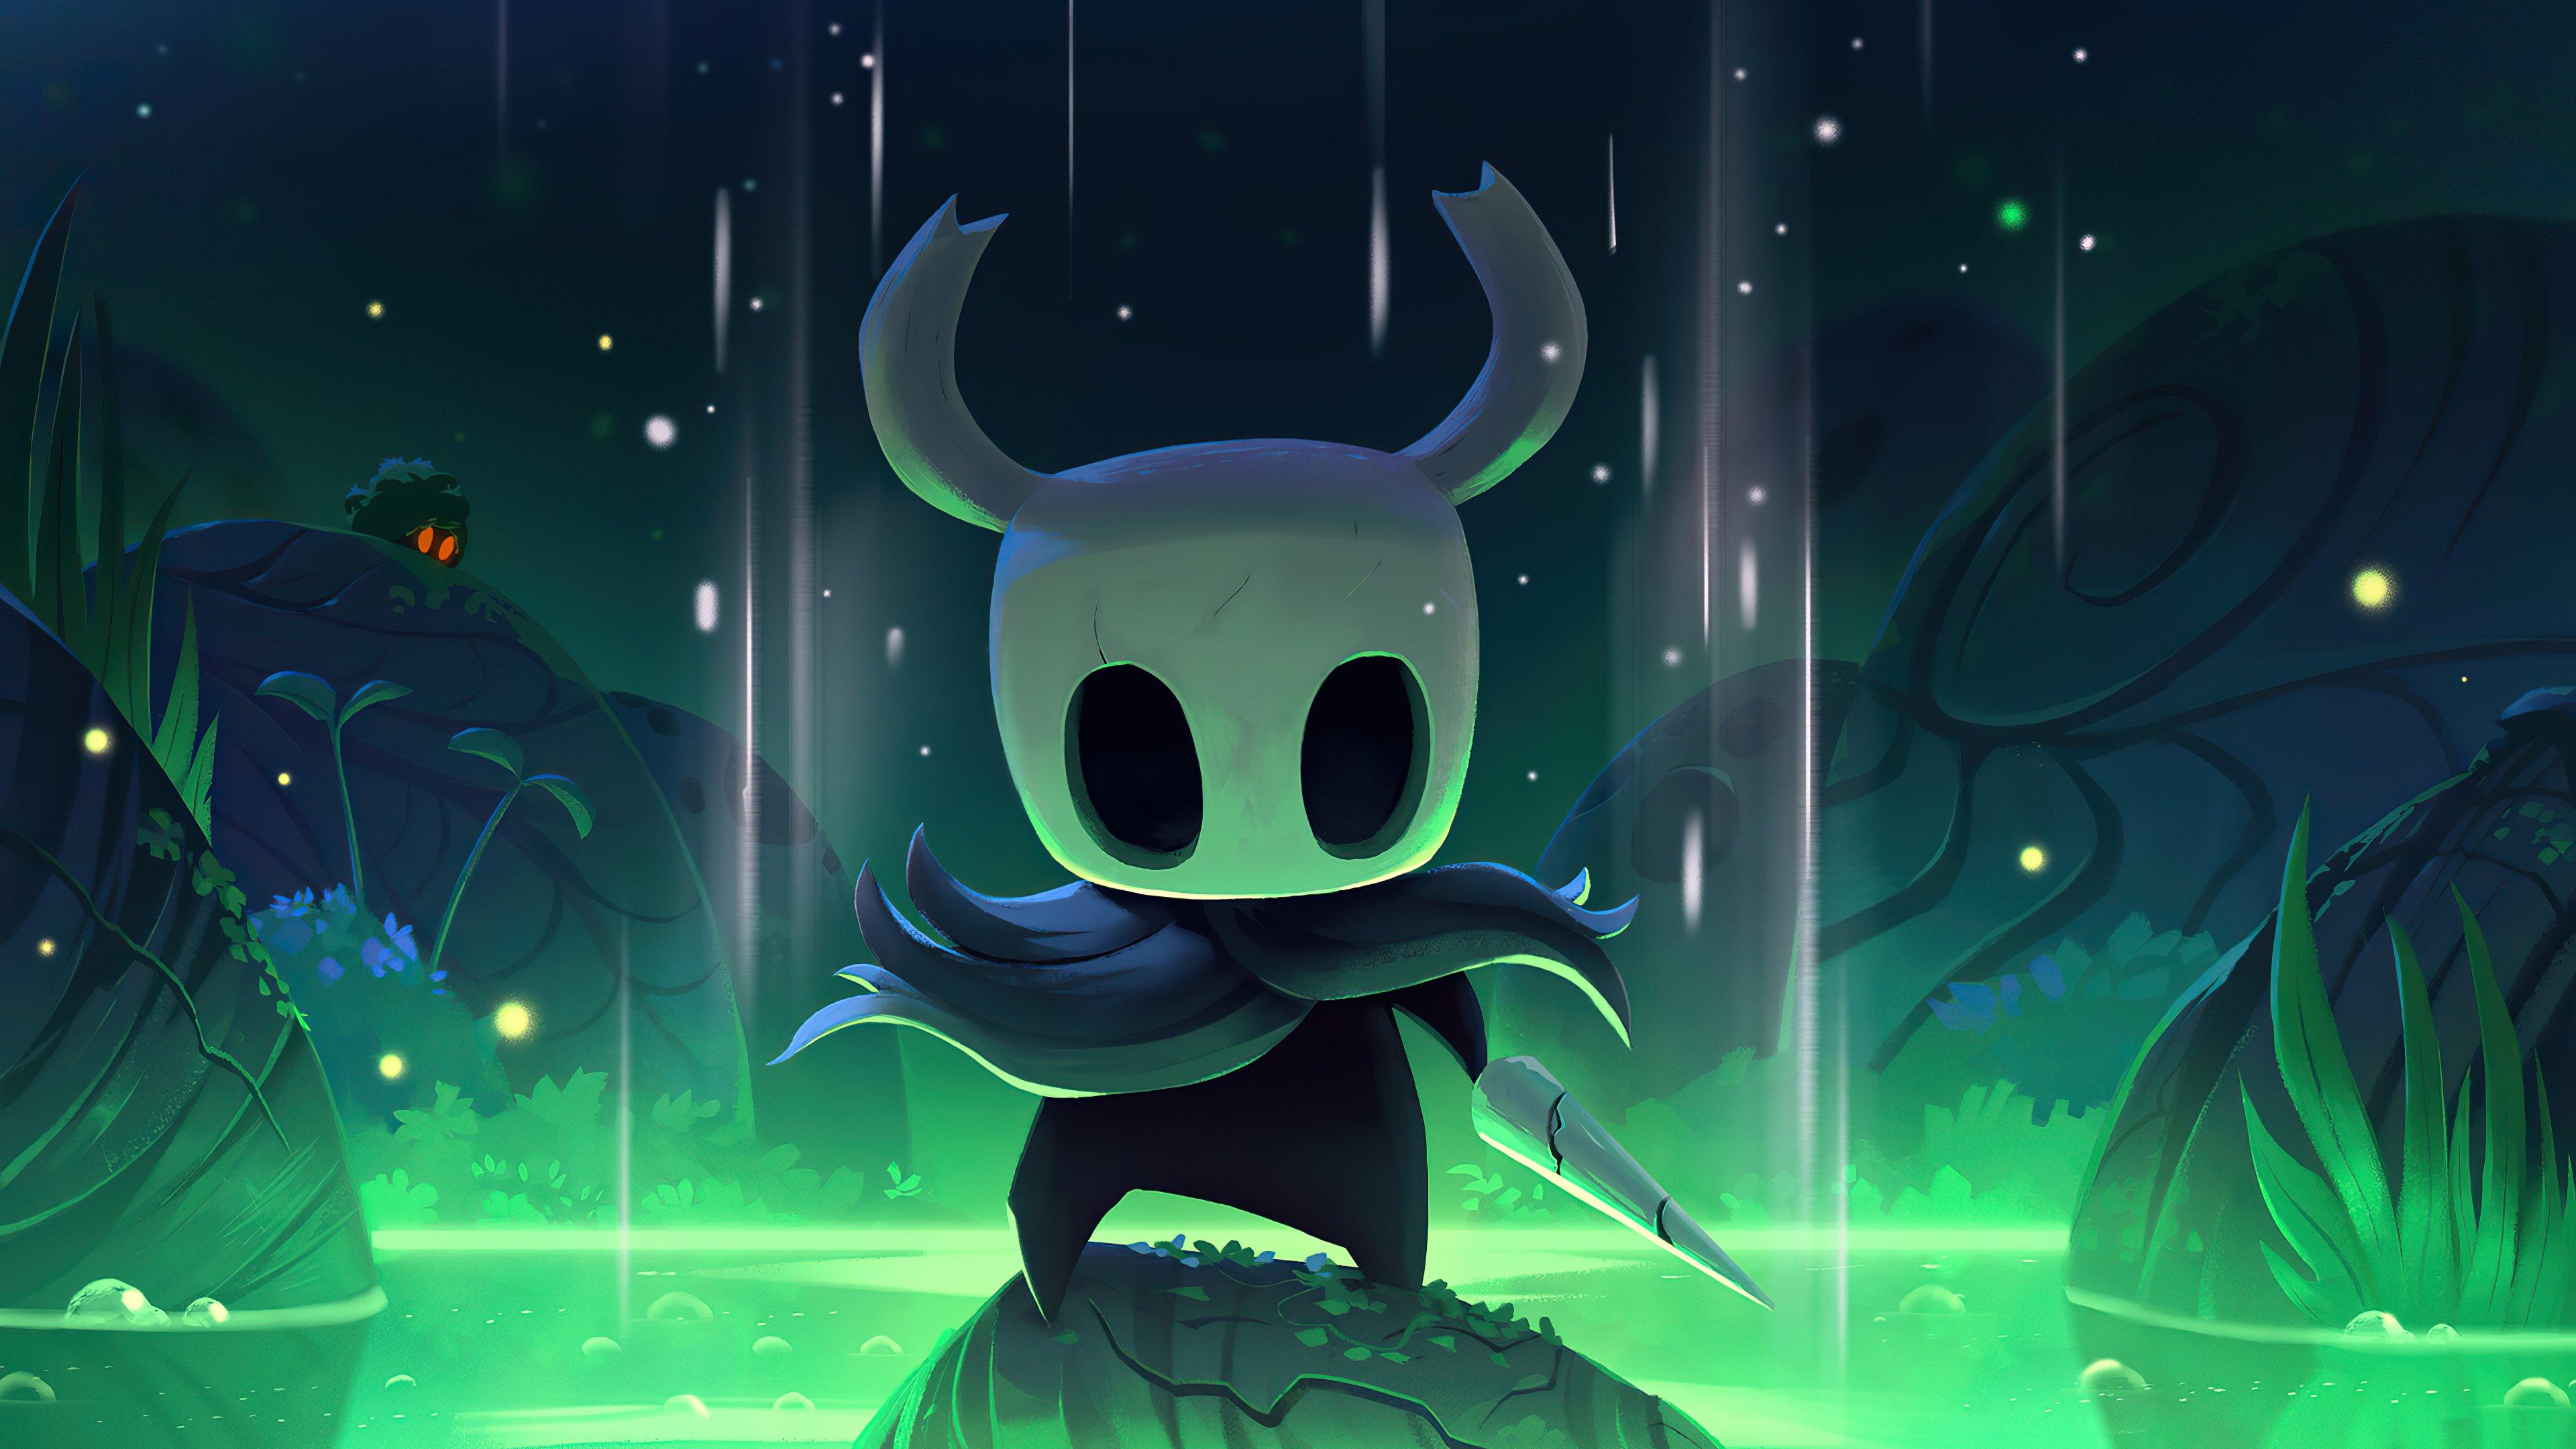 Wallpaper Hollow Knight Fanart